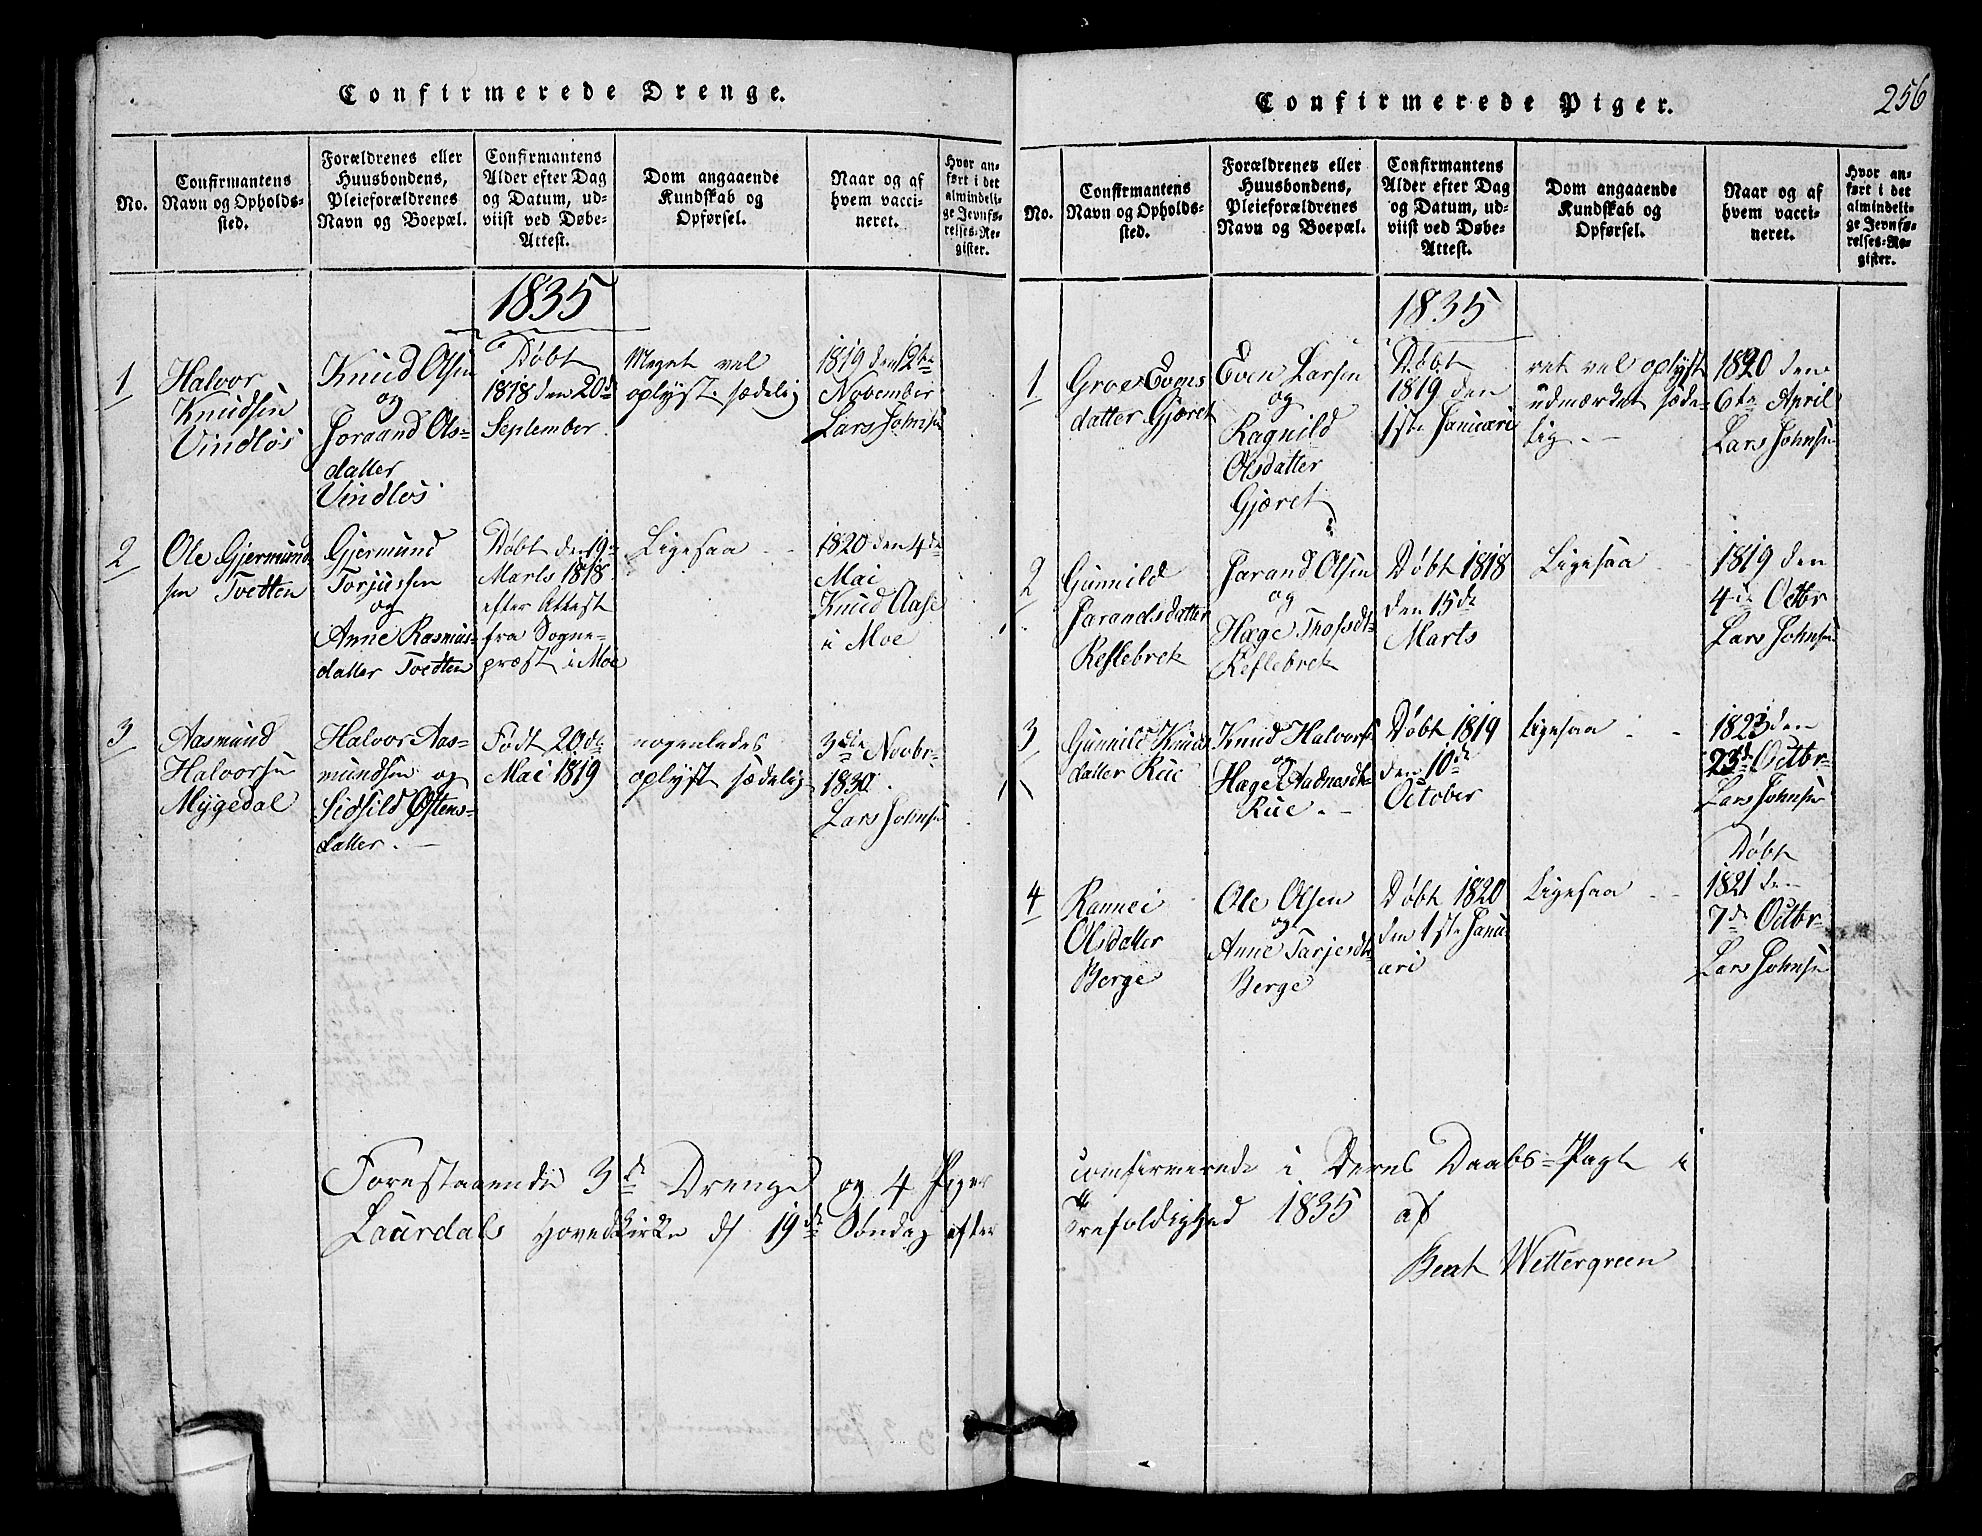 SAKO, Lårdal kirkebøker, G/Gb/L0001: Klokkerbok nr. II 1, 1815-1865, s. 256